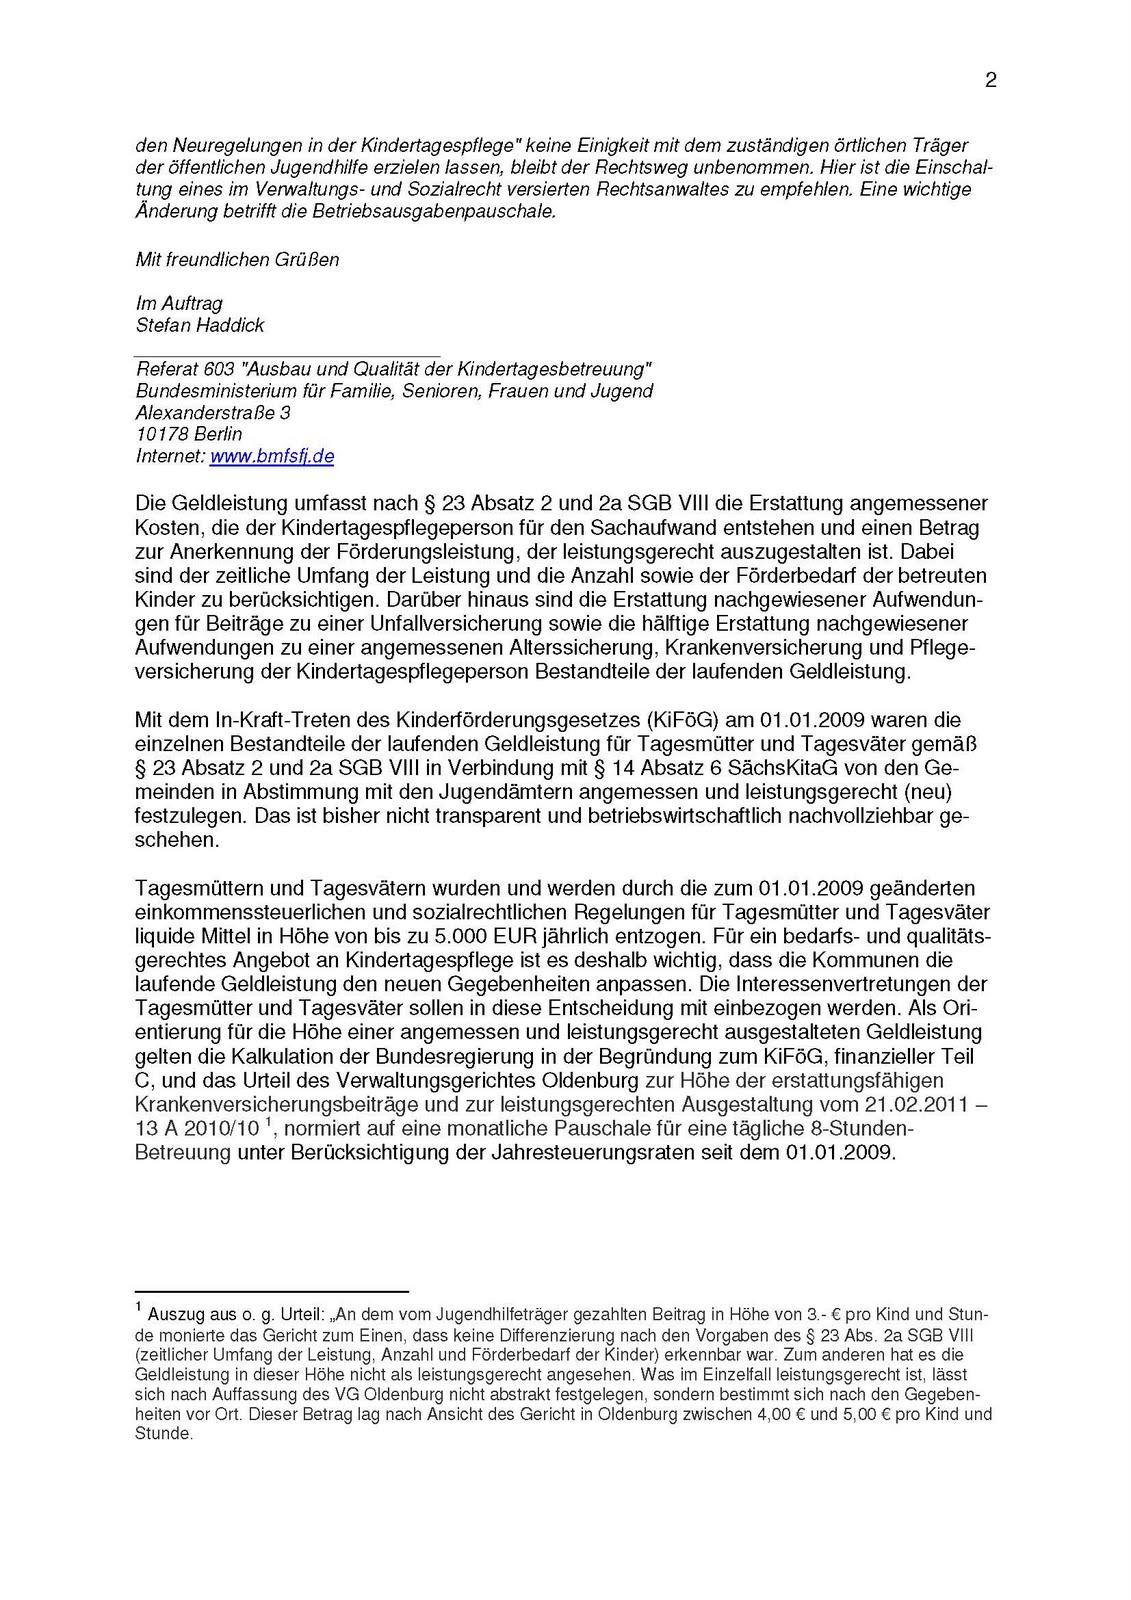 Die Interessengemeinschaft Kindertagespflege Dresden: Petition an ...